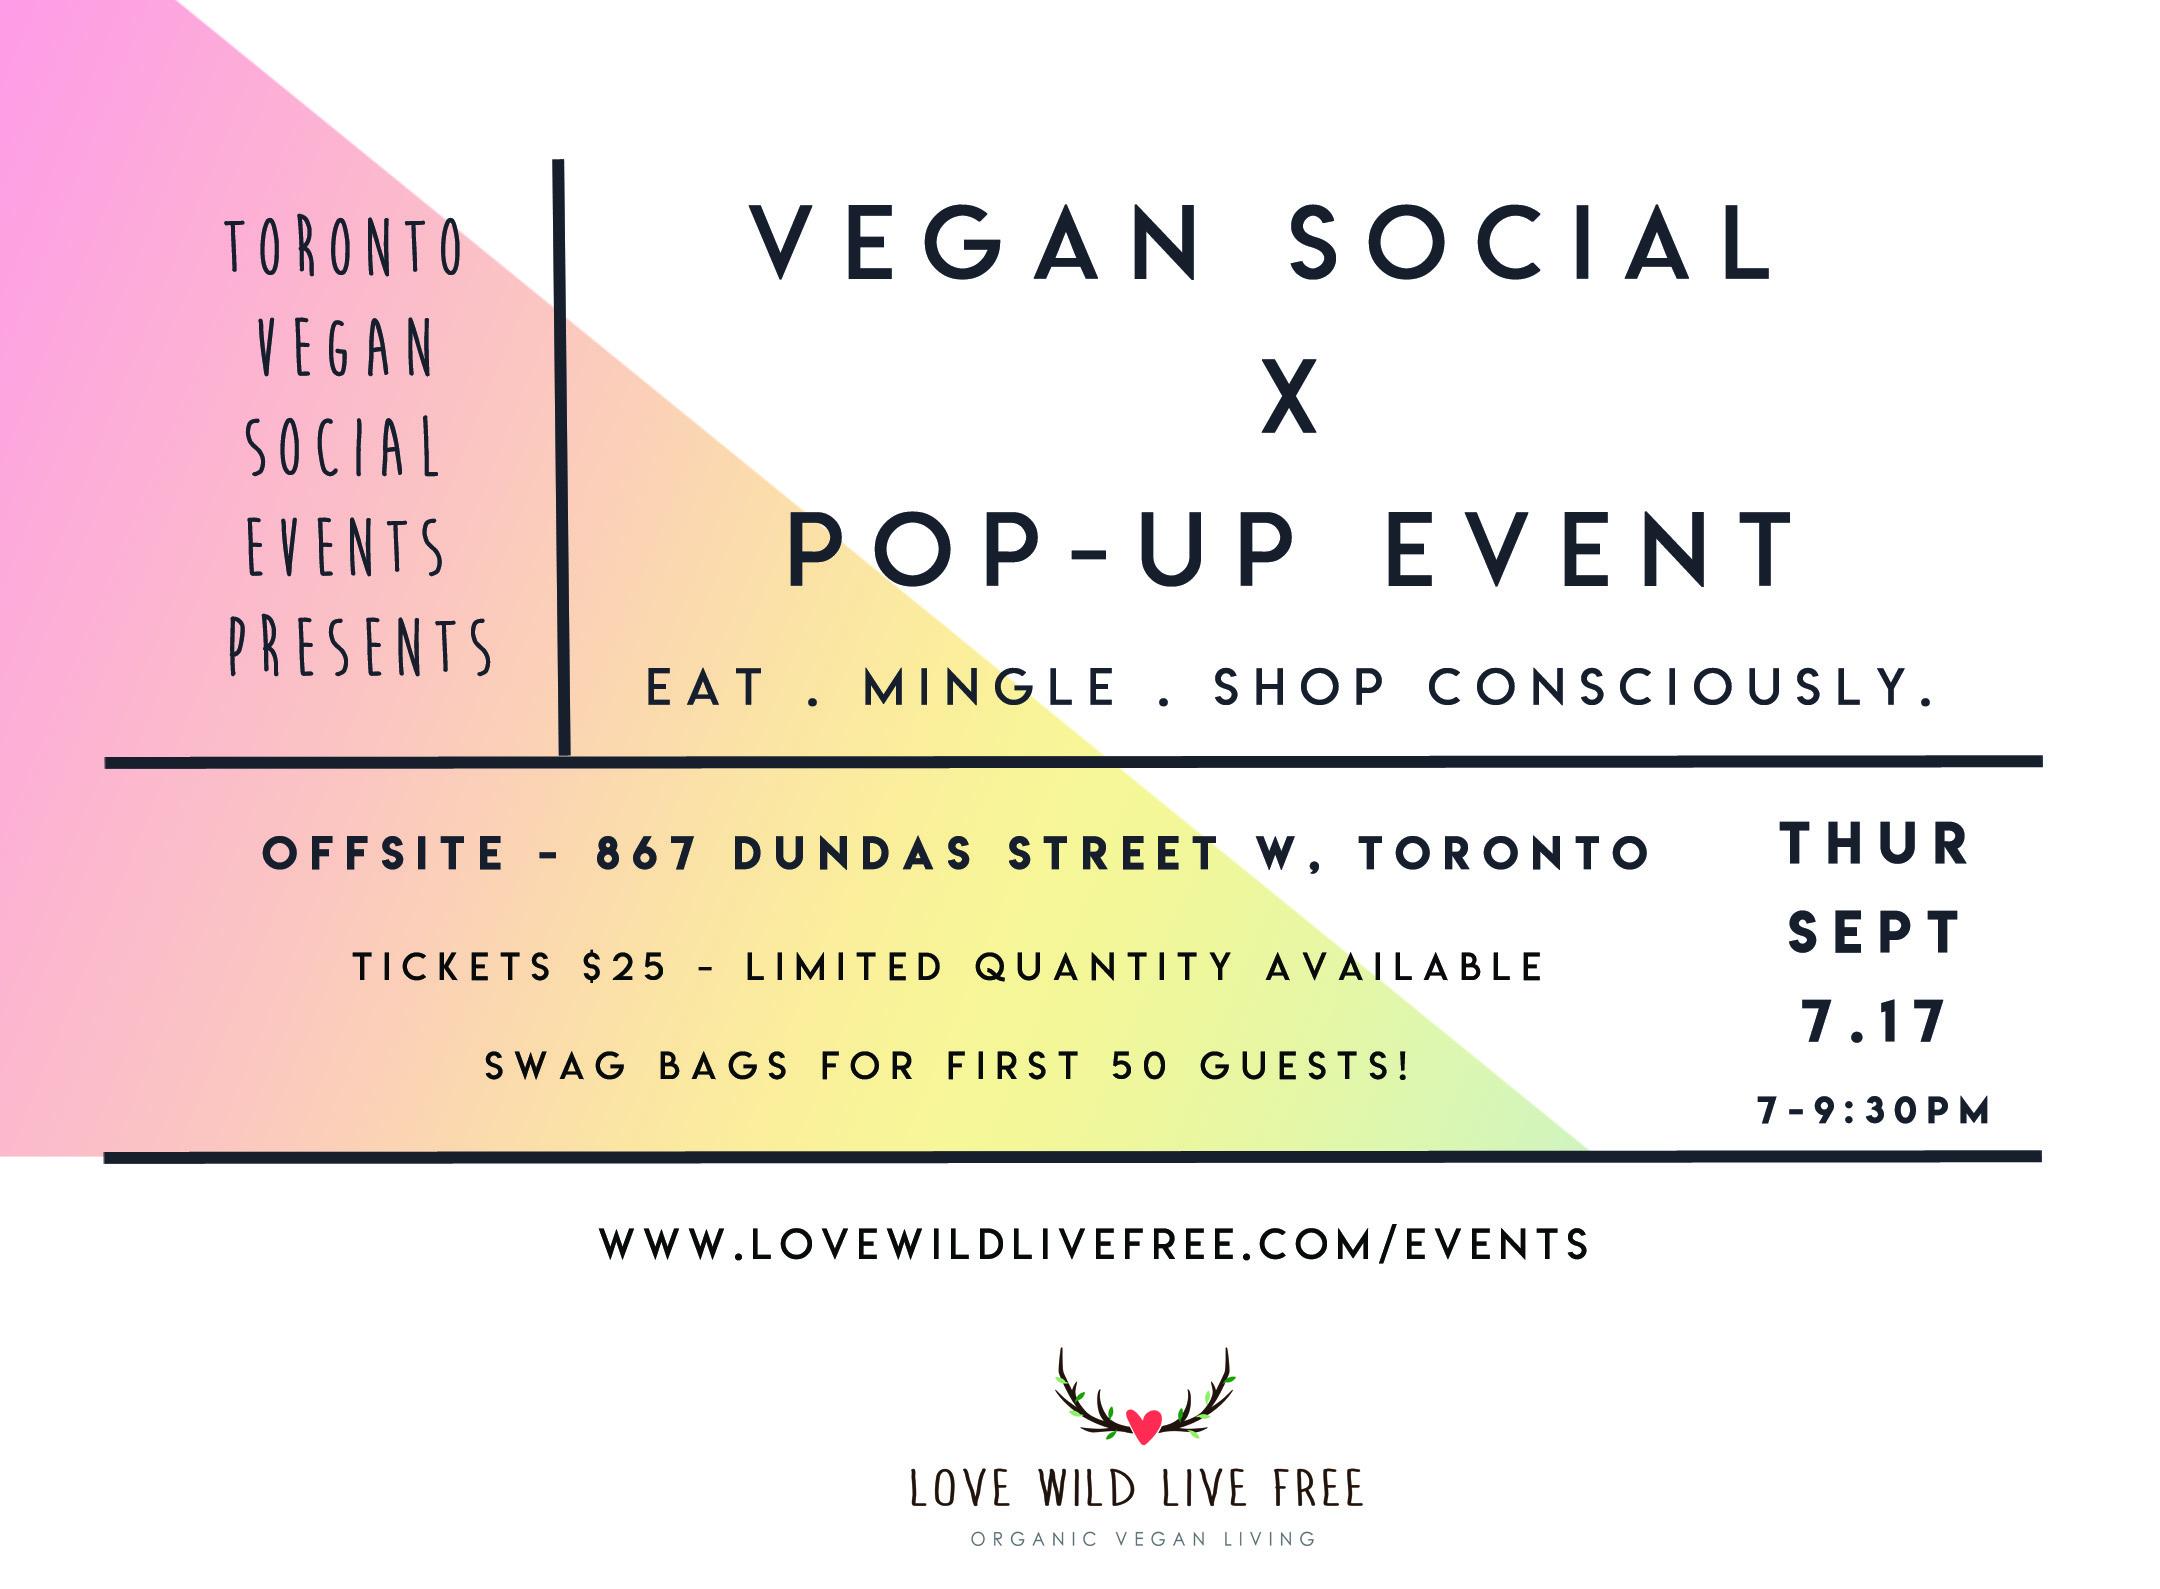 Toronto Vegan Social Pop-Up Flyer - September 7, 2017.jpg